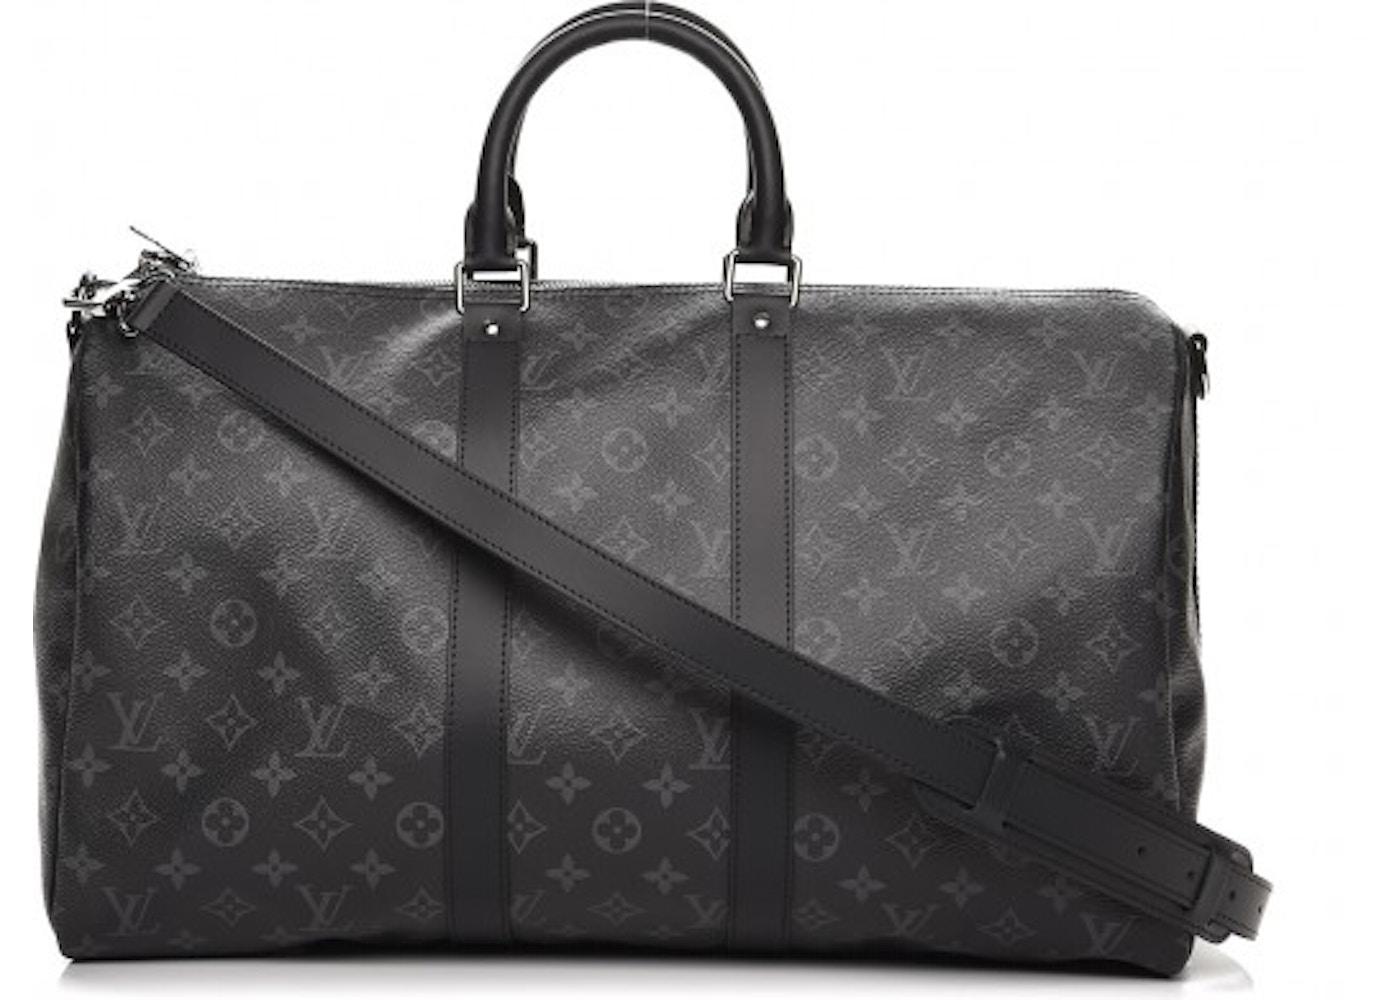 beb1c2ca650f Louis Vuitton Keepall Bandouliere Monogram Eclipse 45 Black Grey (No  Accessories). Monogram Eclipse 45 Black Grey (No Accessories)